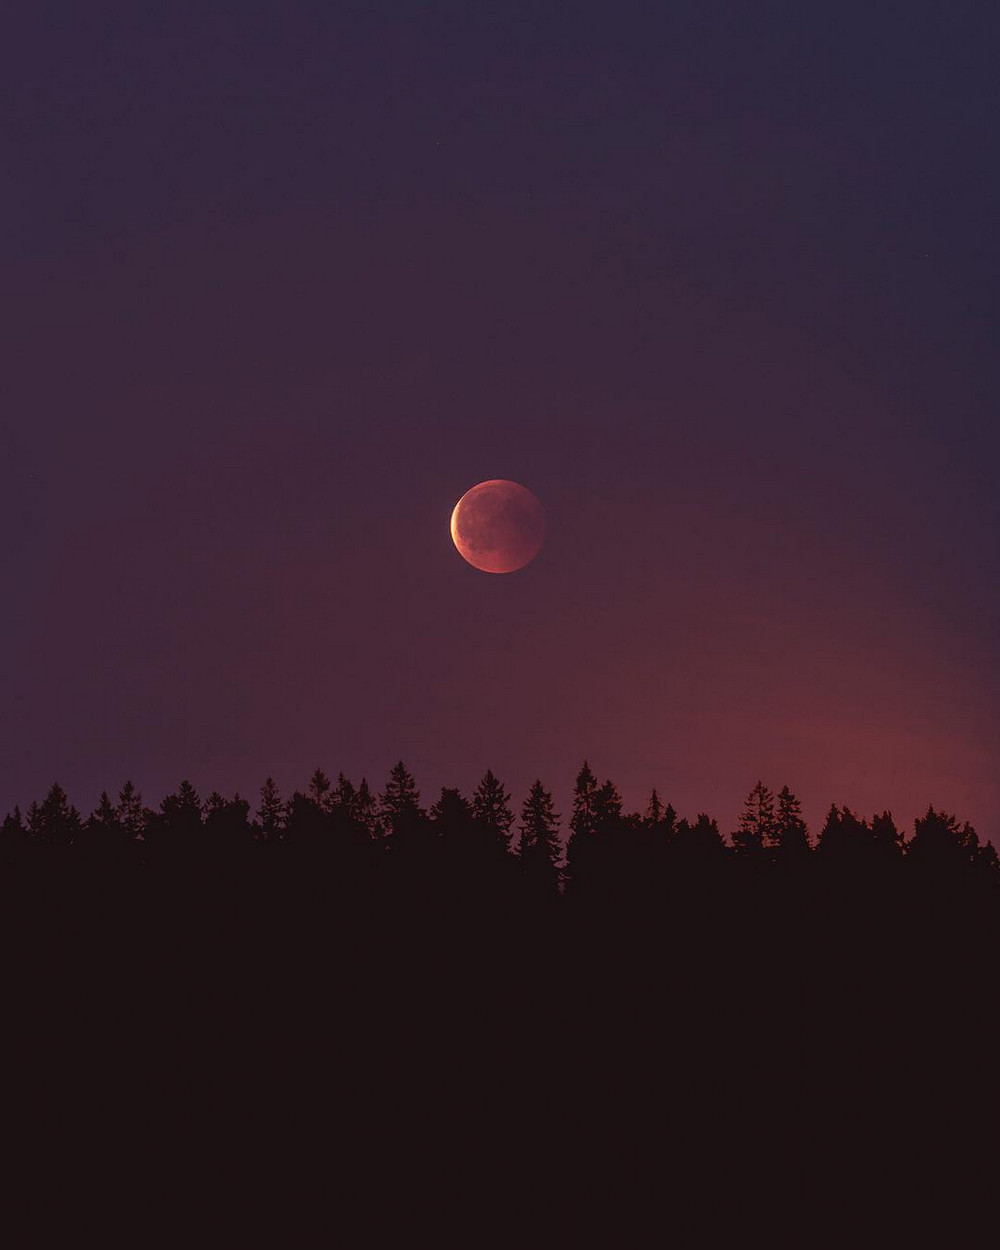 fotografii_norvegiji-17